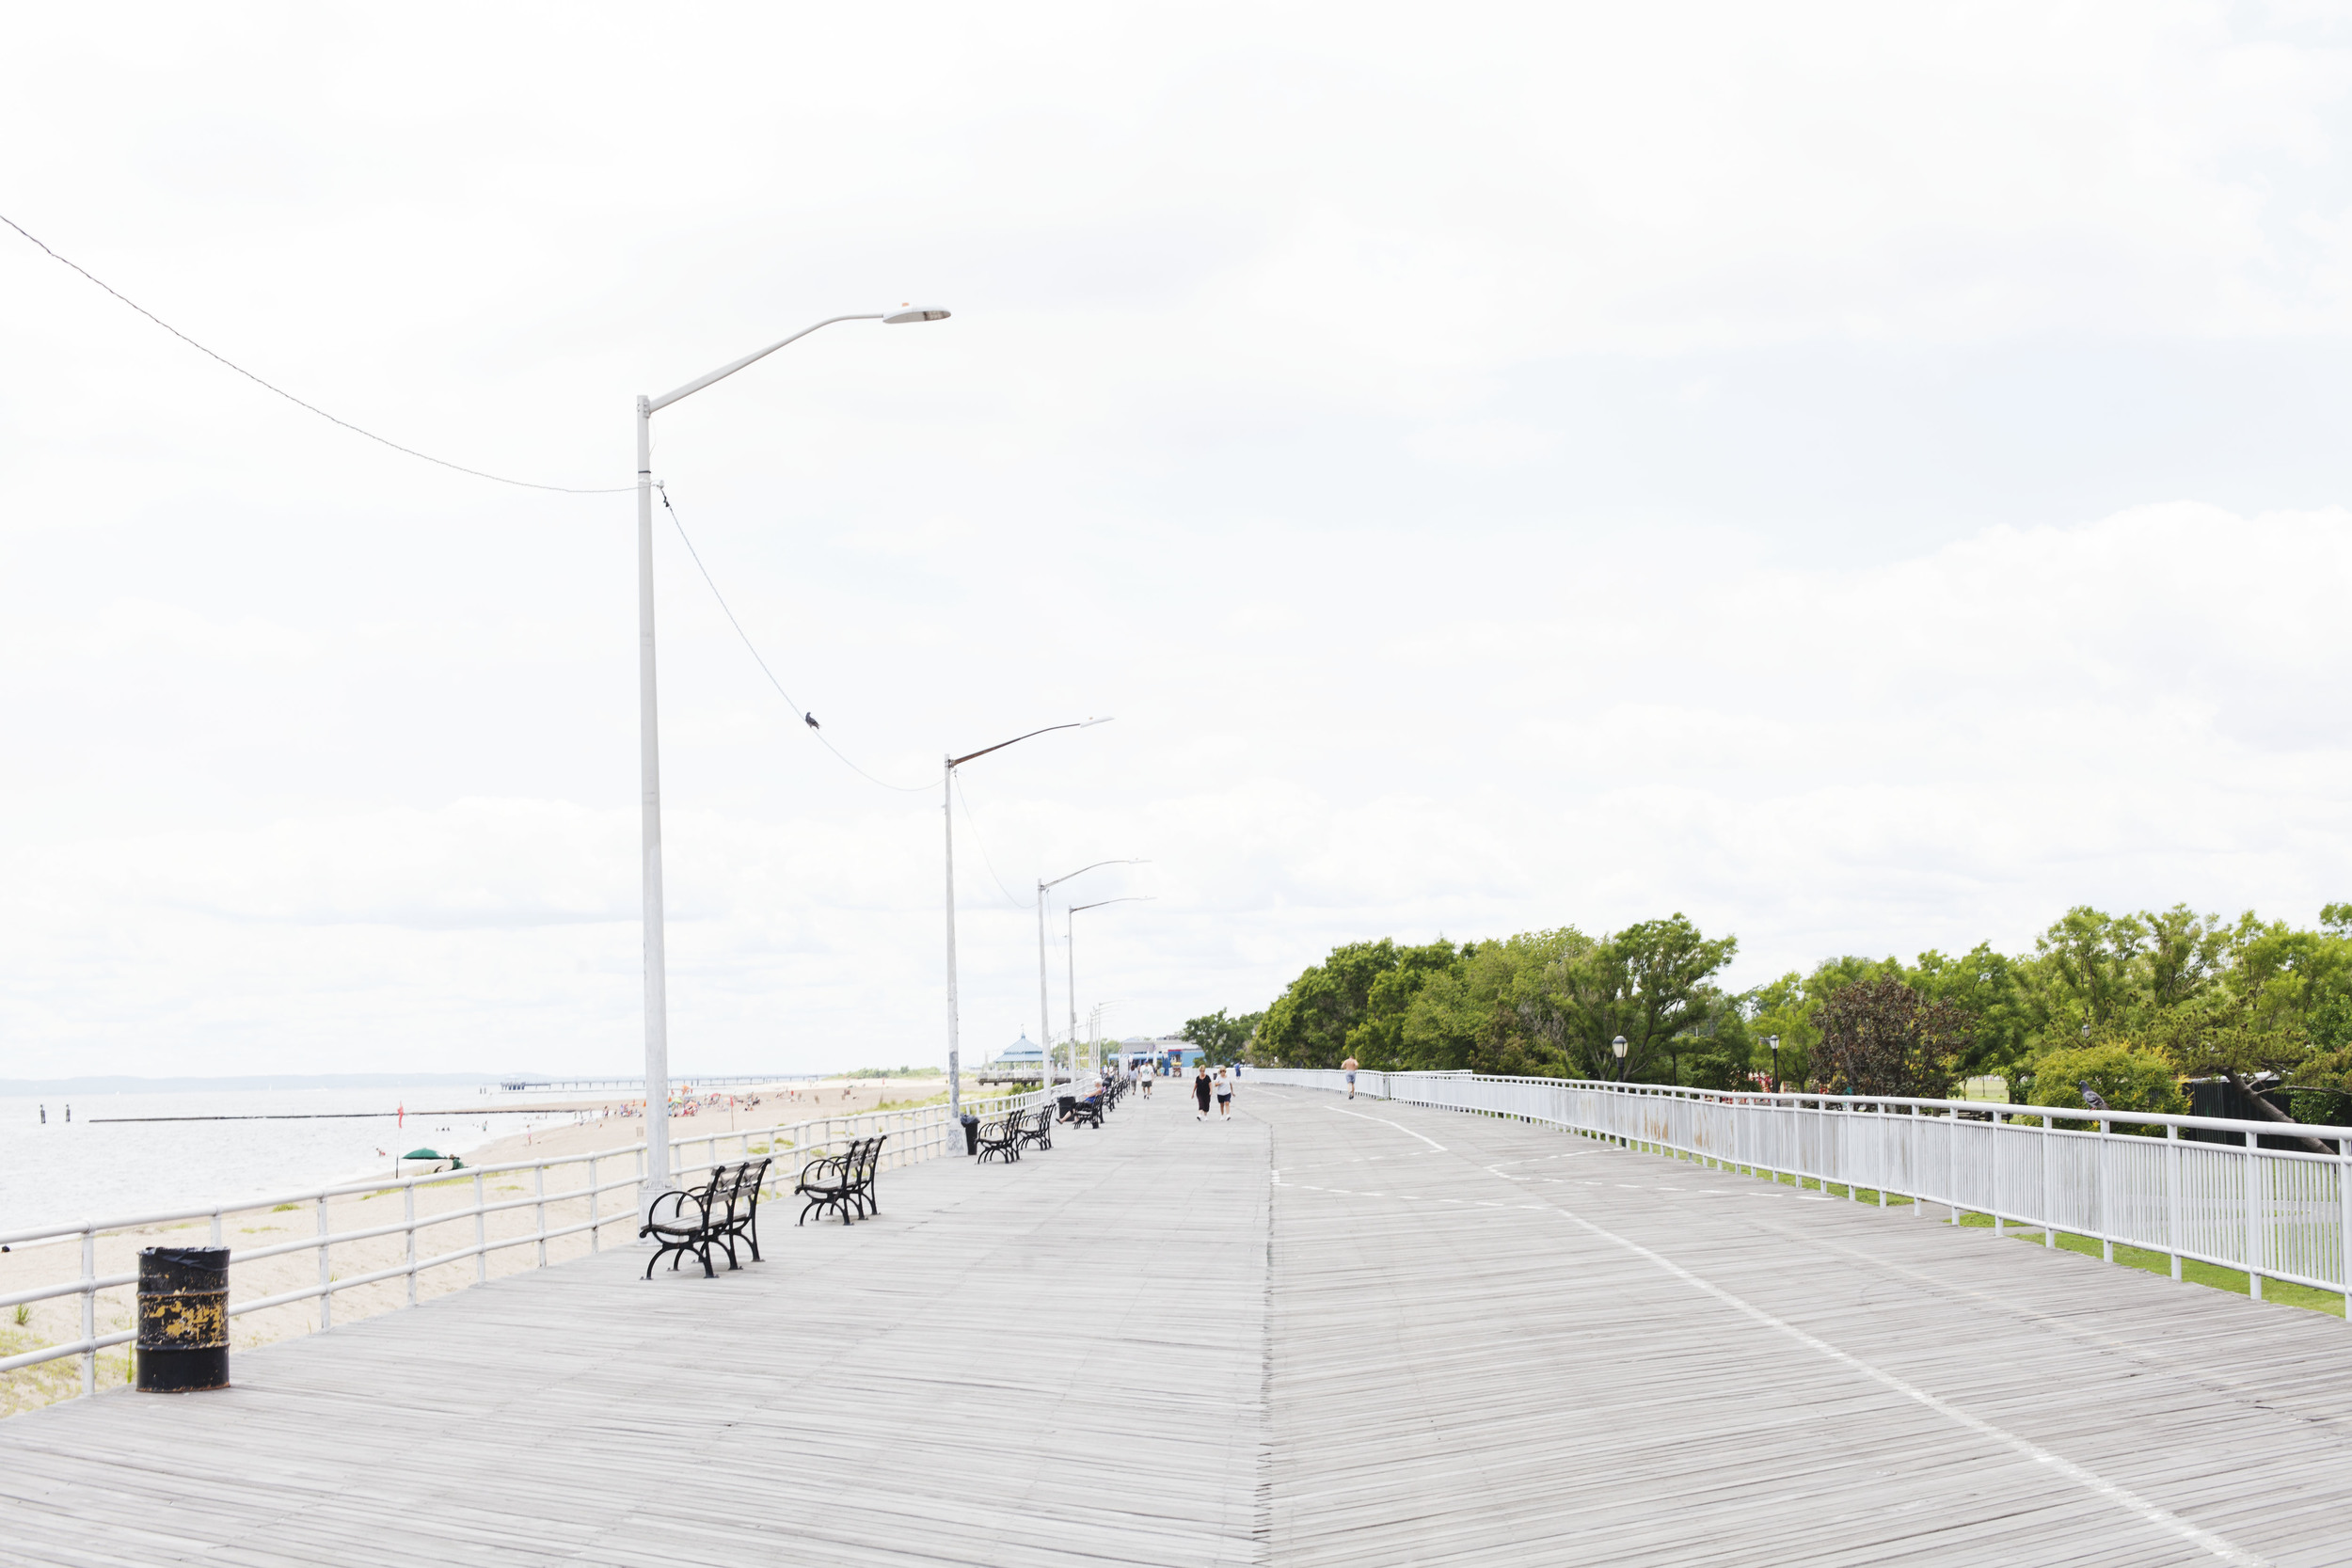 Staten_Island_Ride_24.jpg